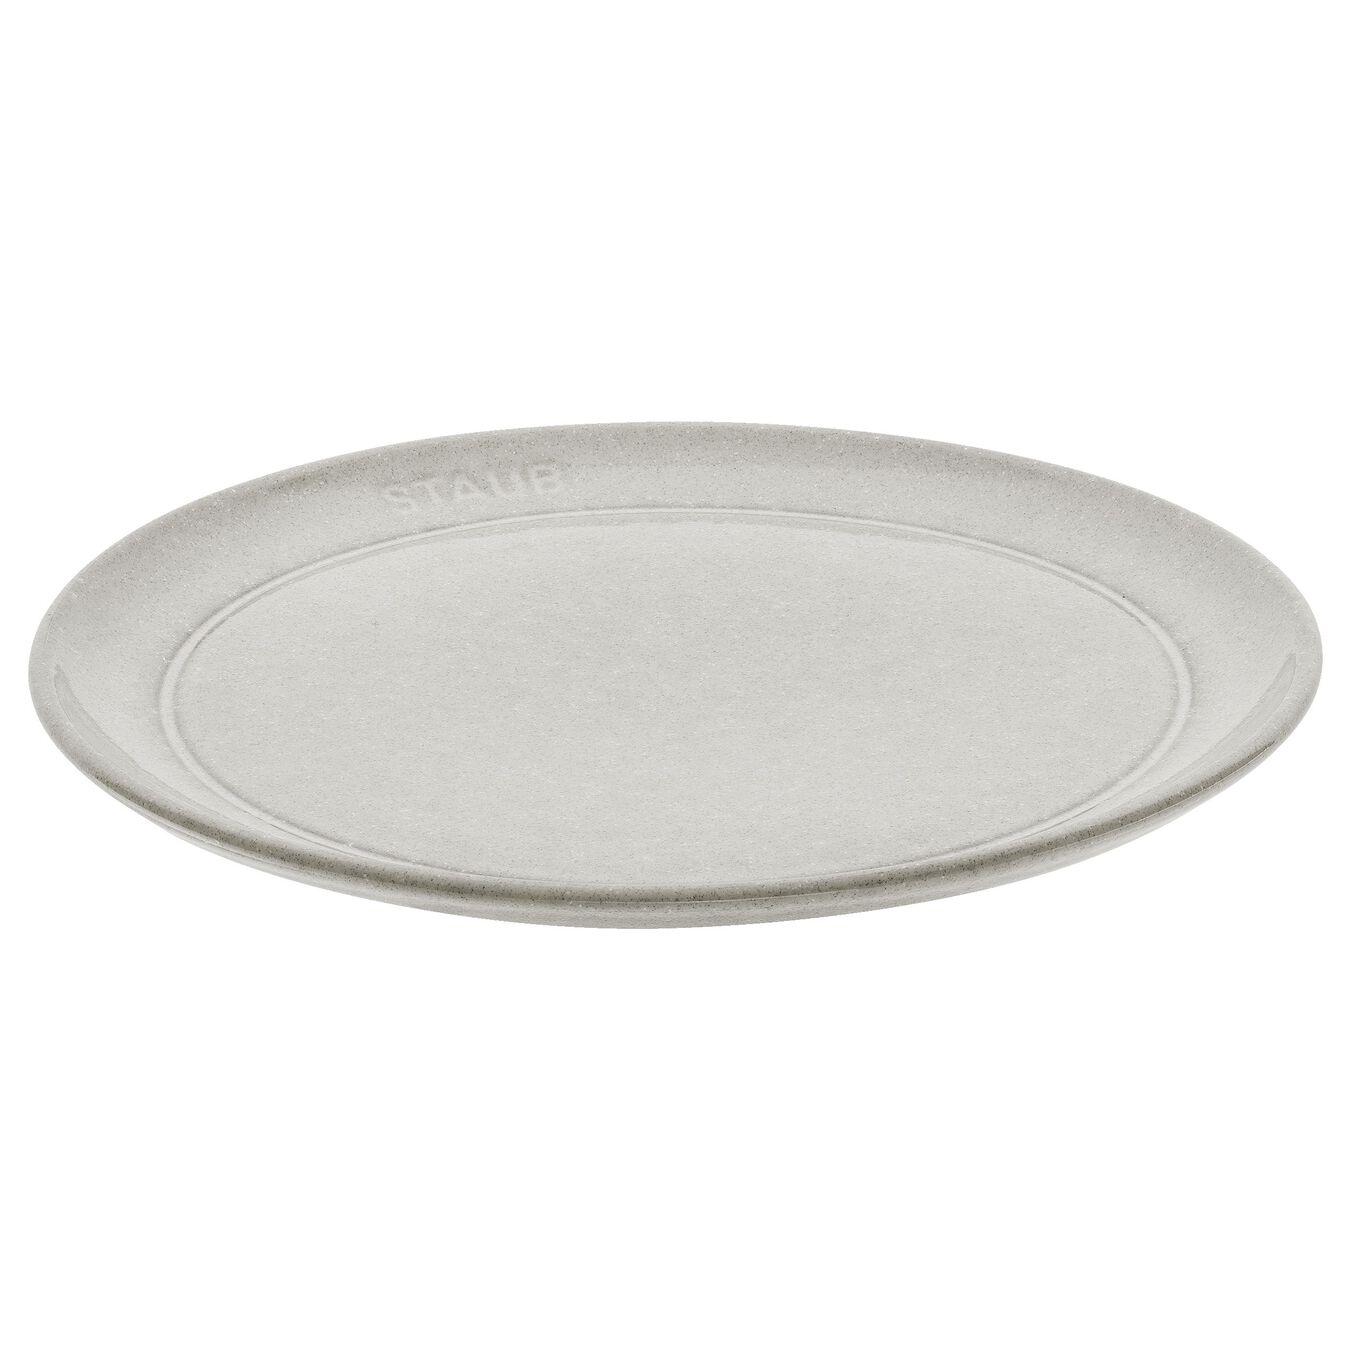 Pasta plate set, 4 Piece | White Truffle | Ceramic | round | Ceramic,,large 1